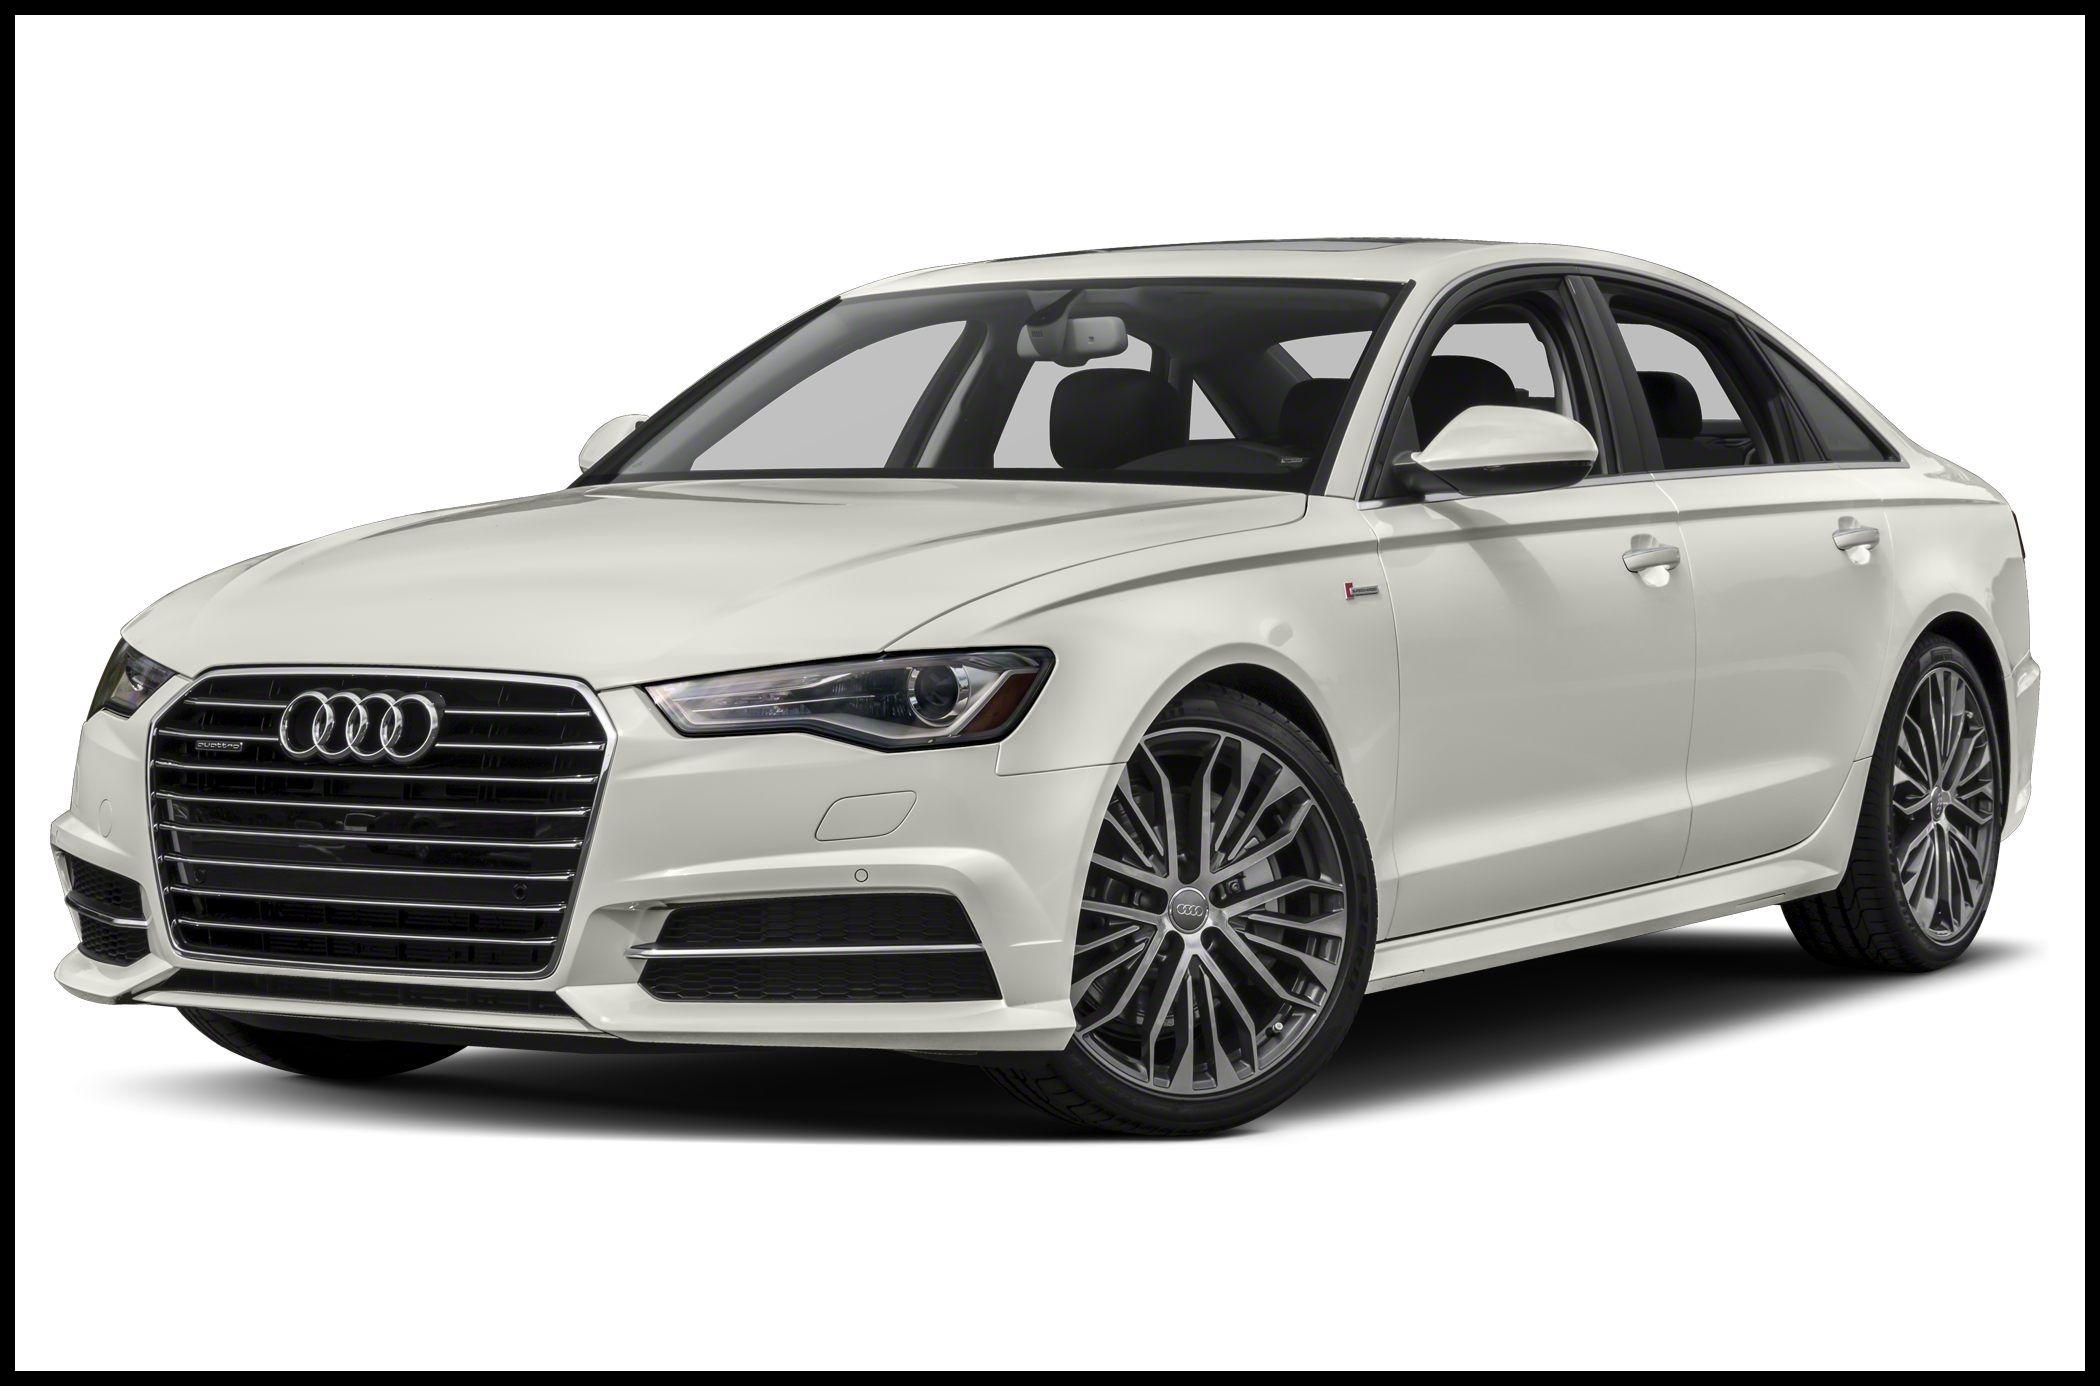 2004 Audi A6 for Sale Elegant 2016 Audi A6 Information